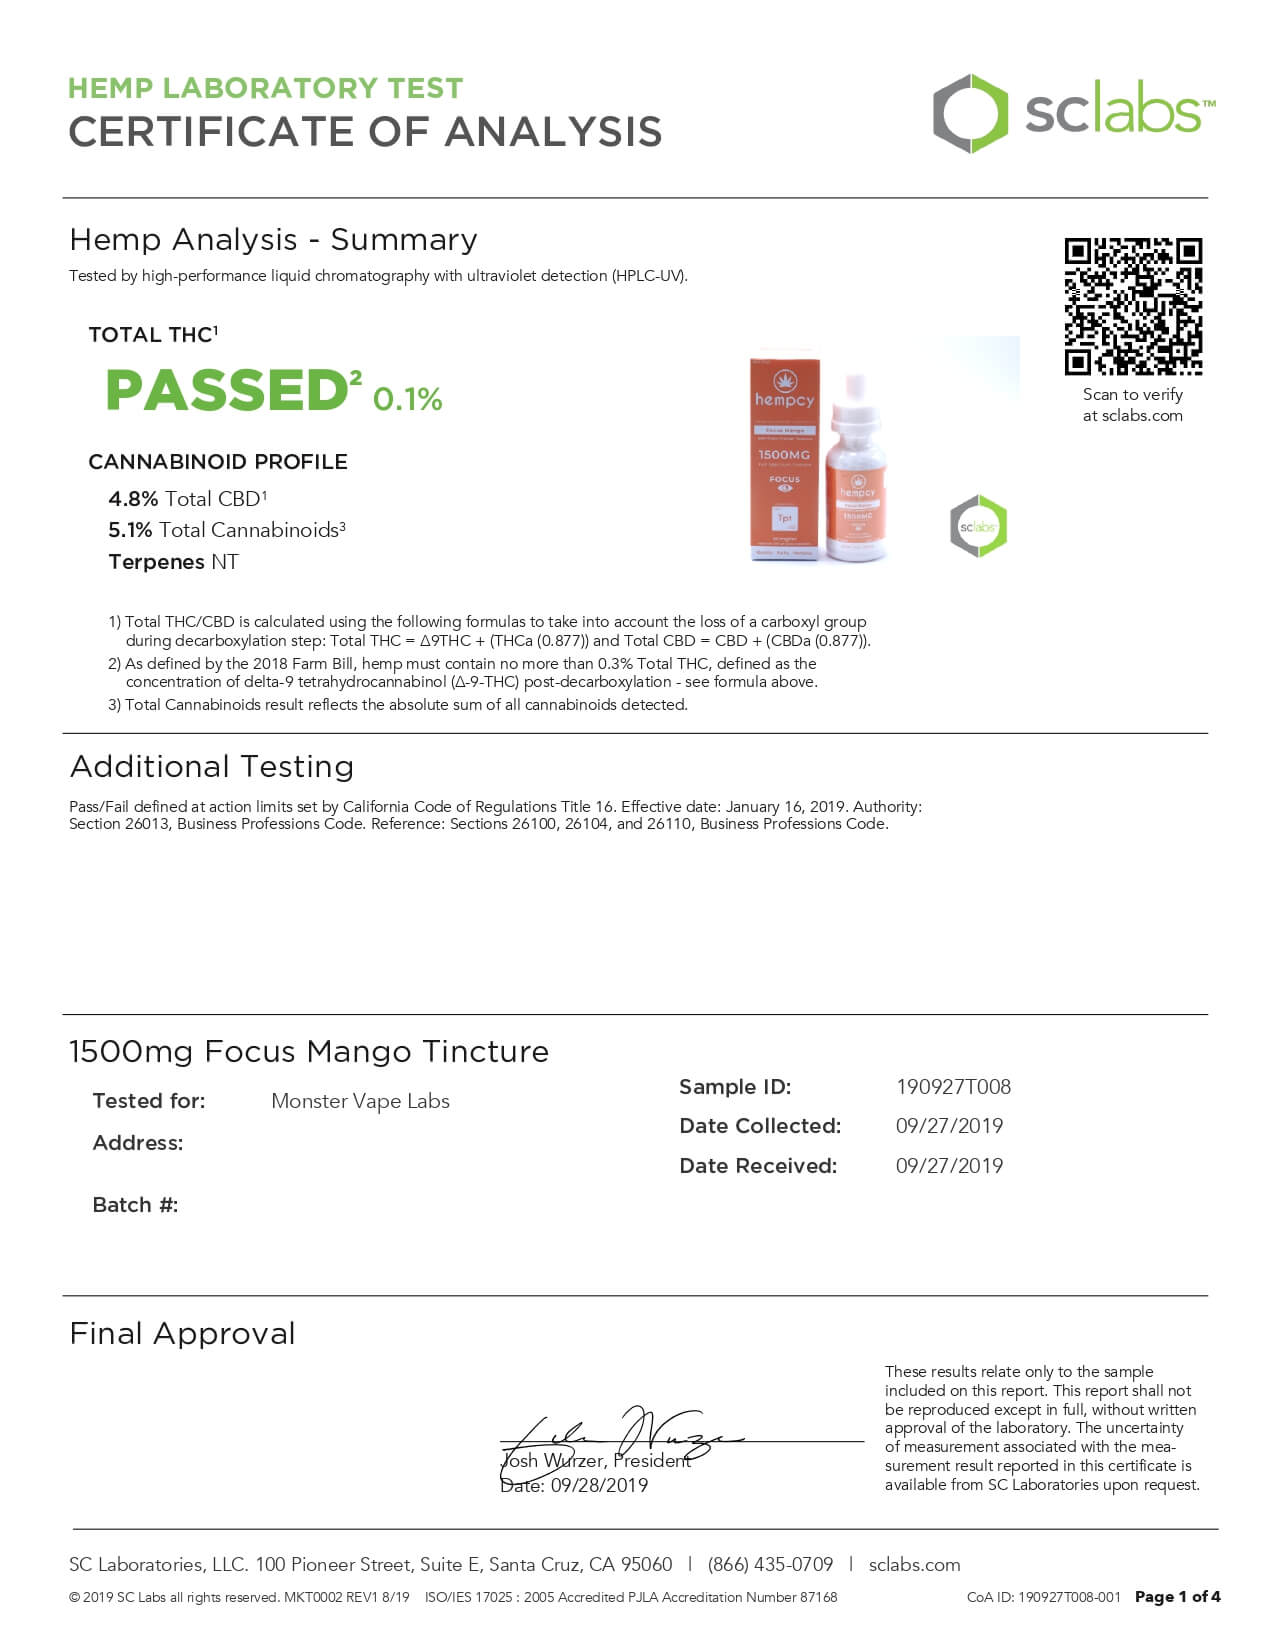 Hempcy CBD Edible Focus Mango 1500mg Lab Report